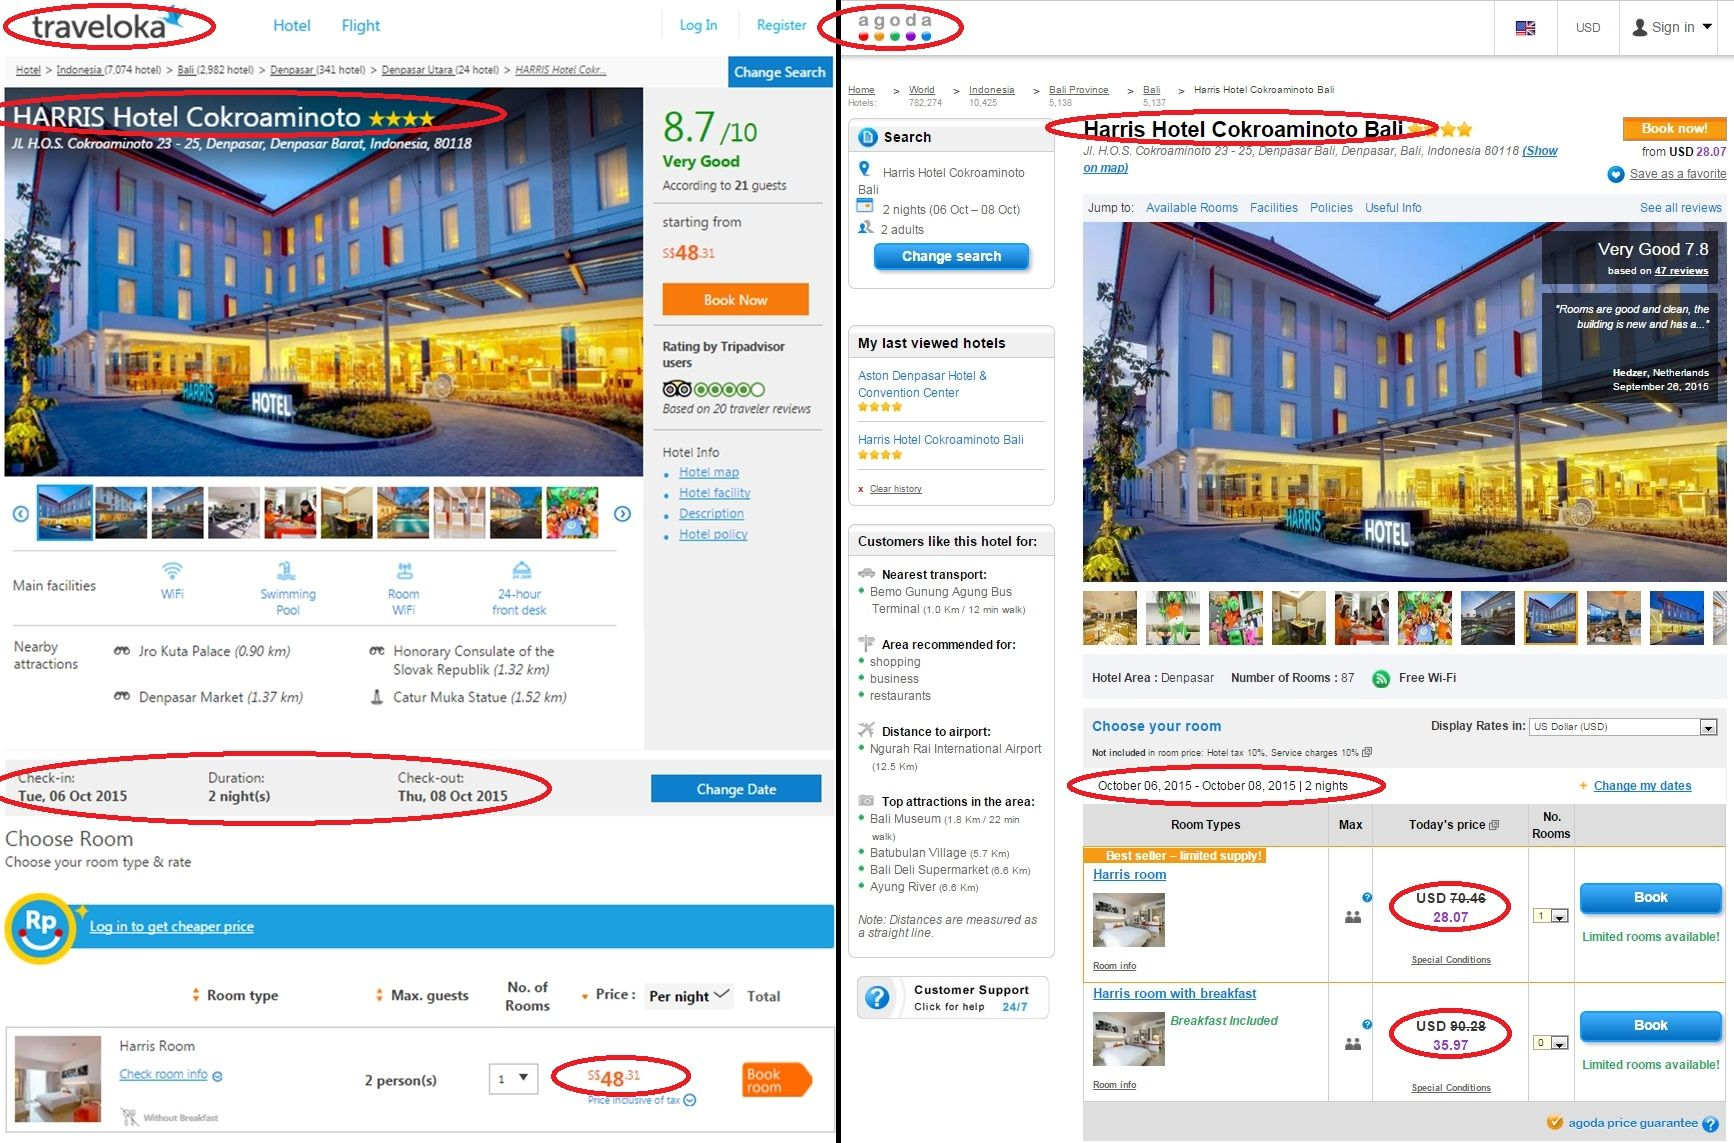 Mana Yang Lebih Murah Harga Booking Tiket Harris Hotel